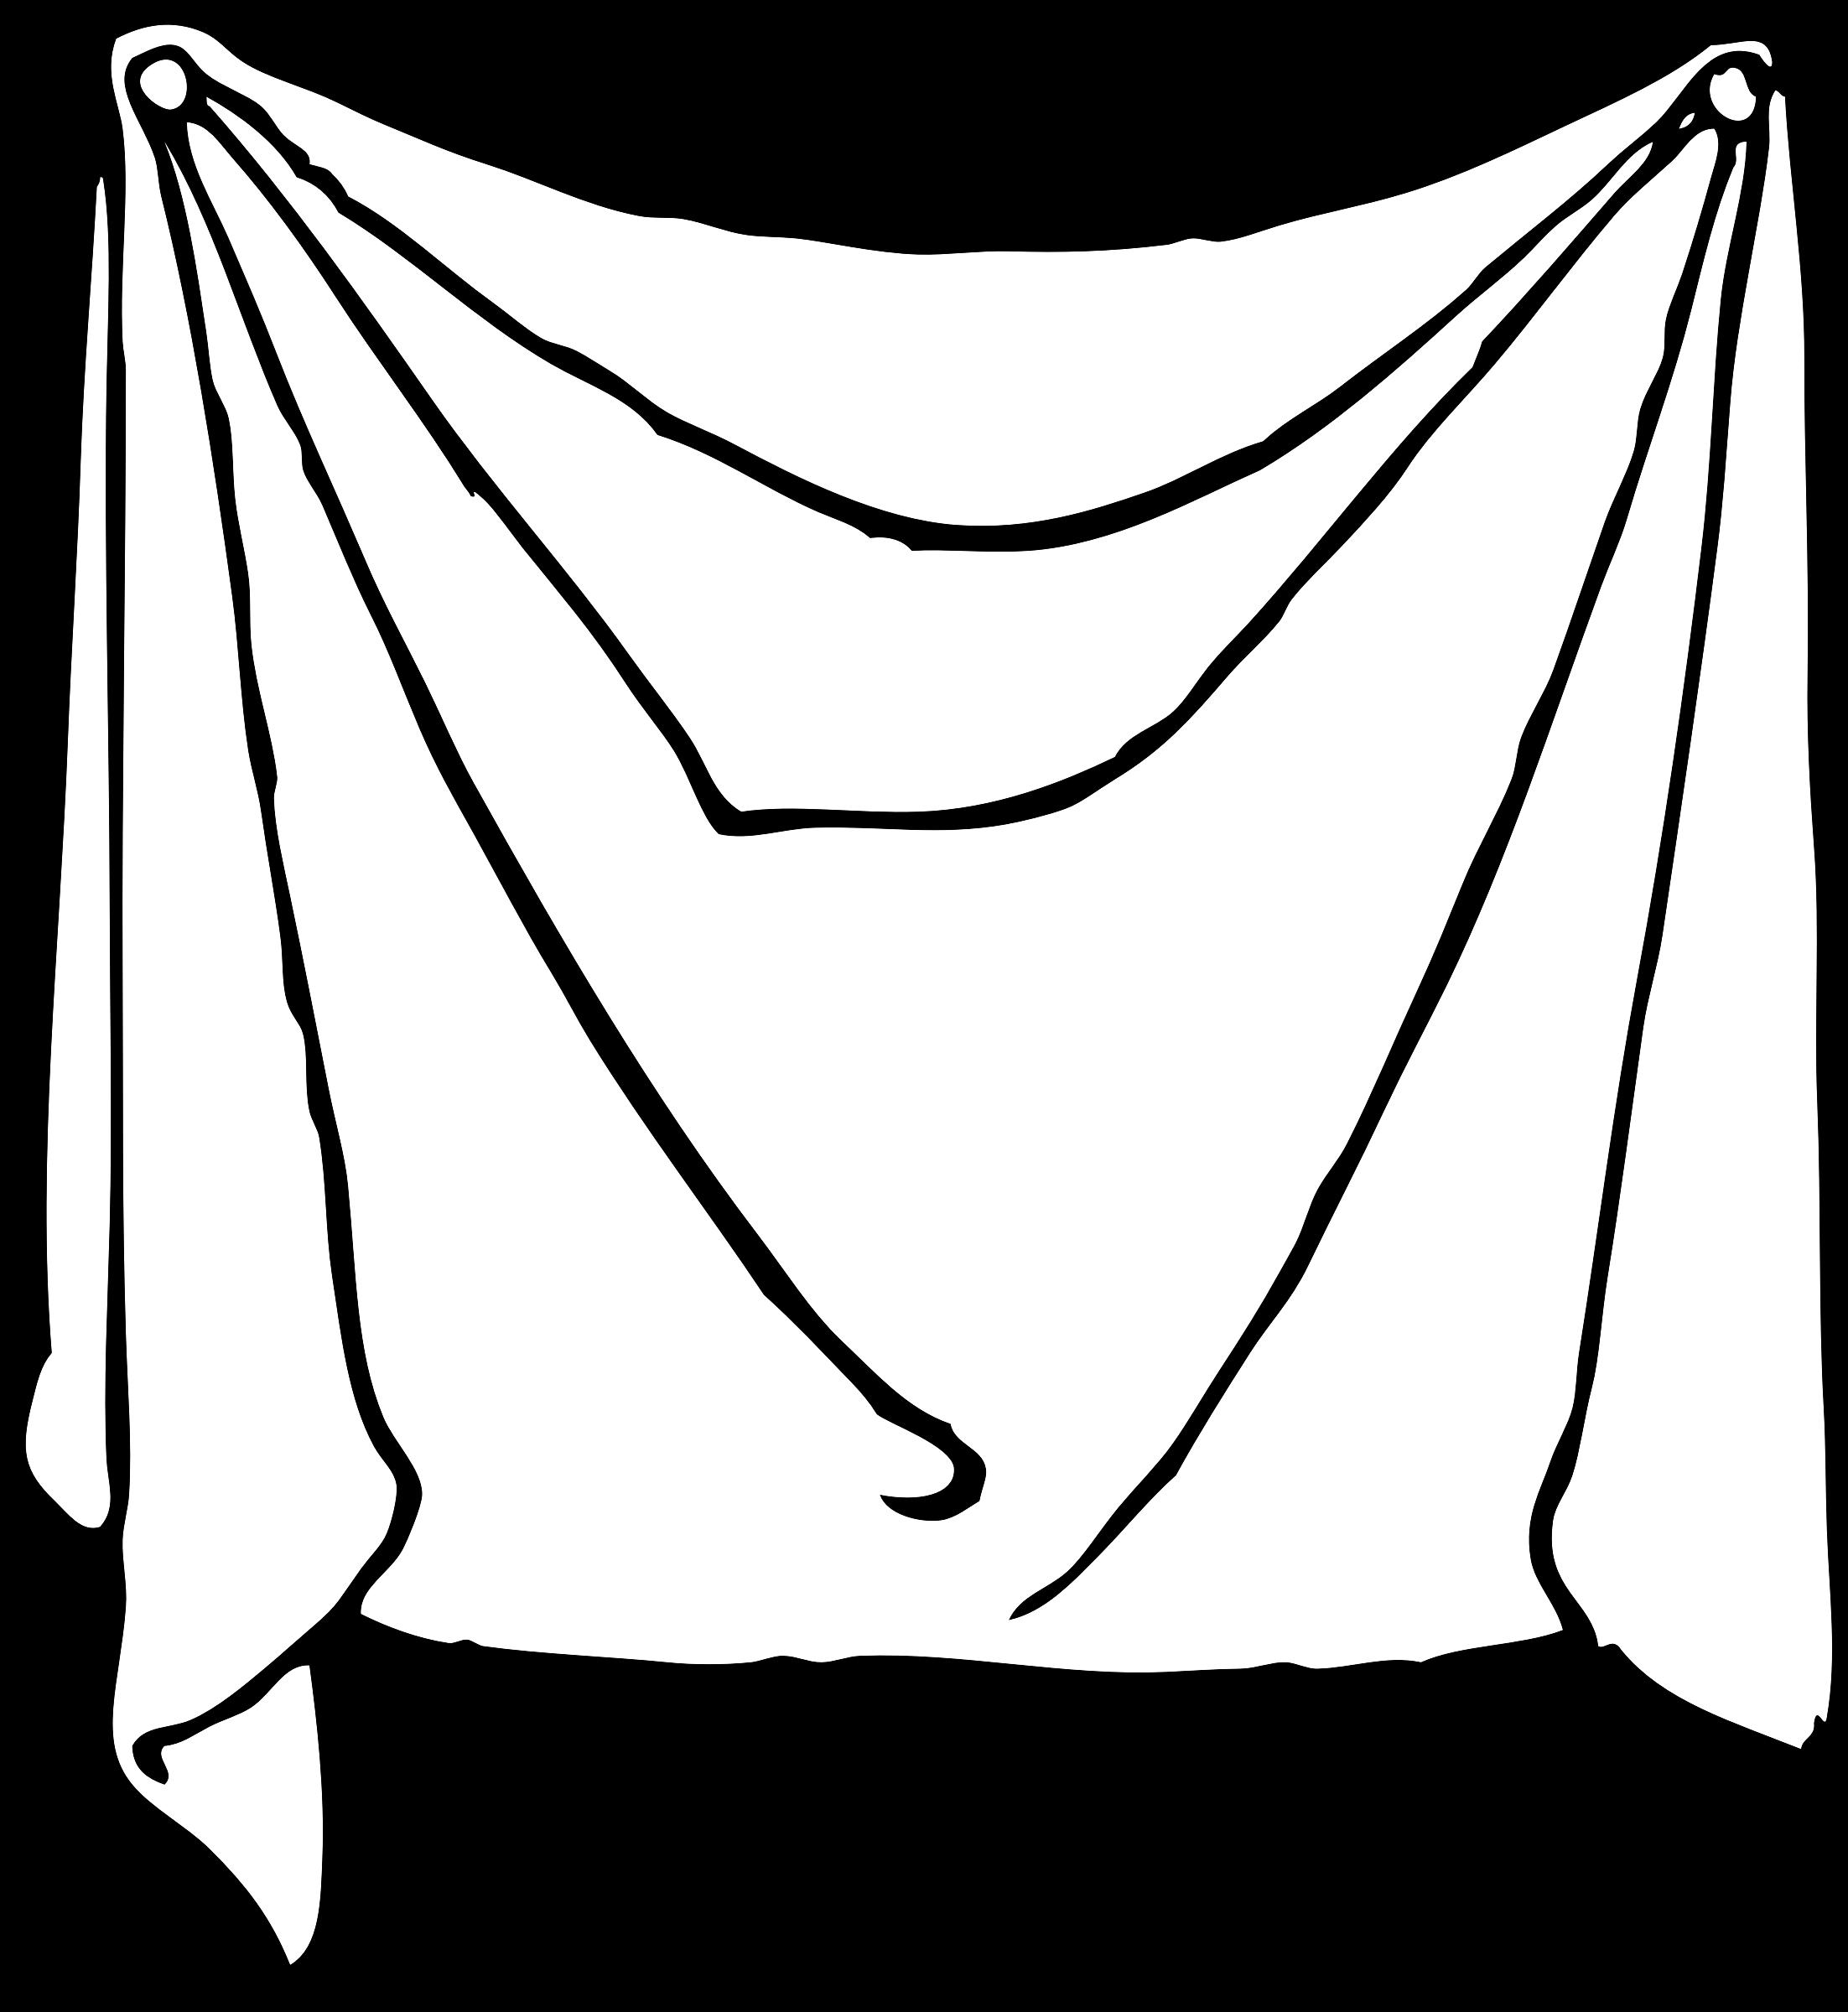 Clipart Bed Sheet.